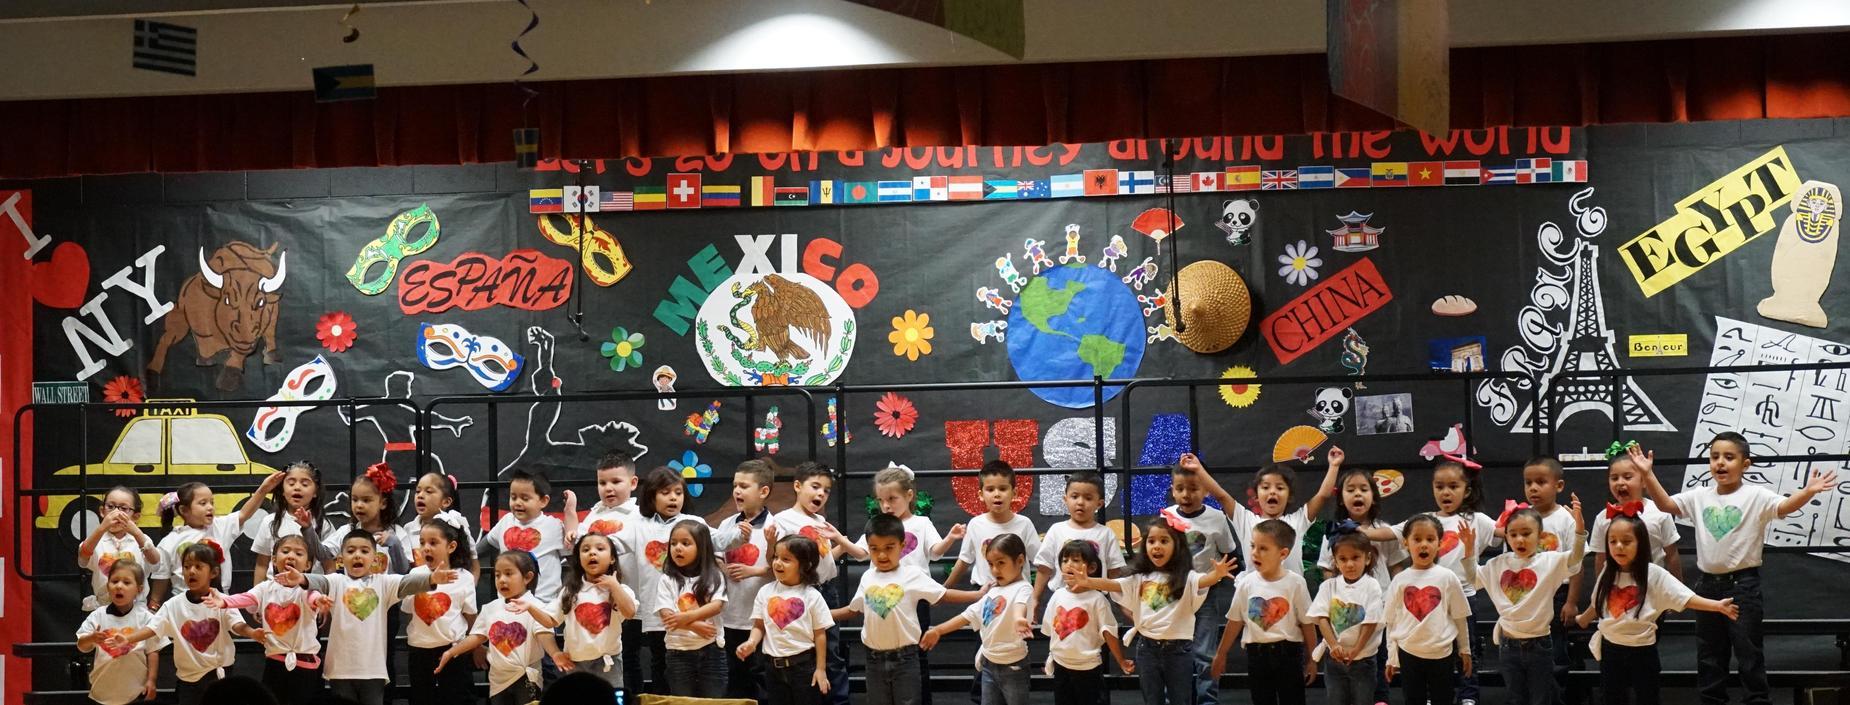 Pre-K Students Choir Performance